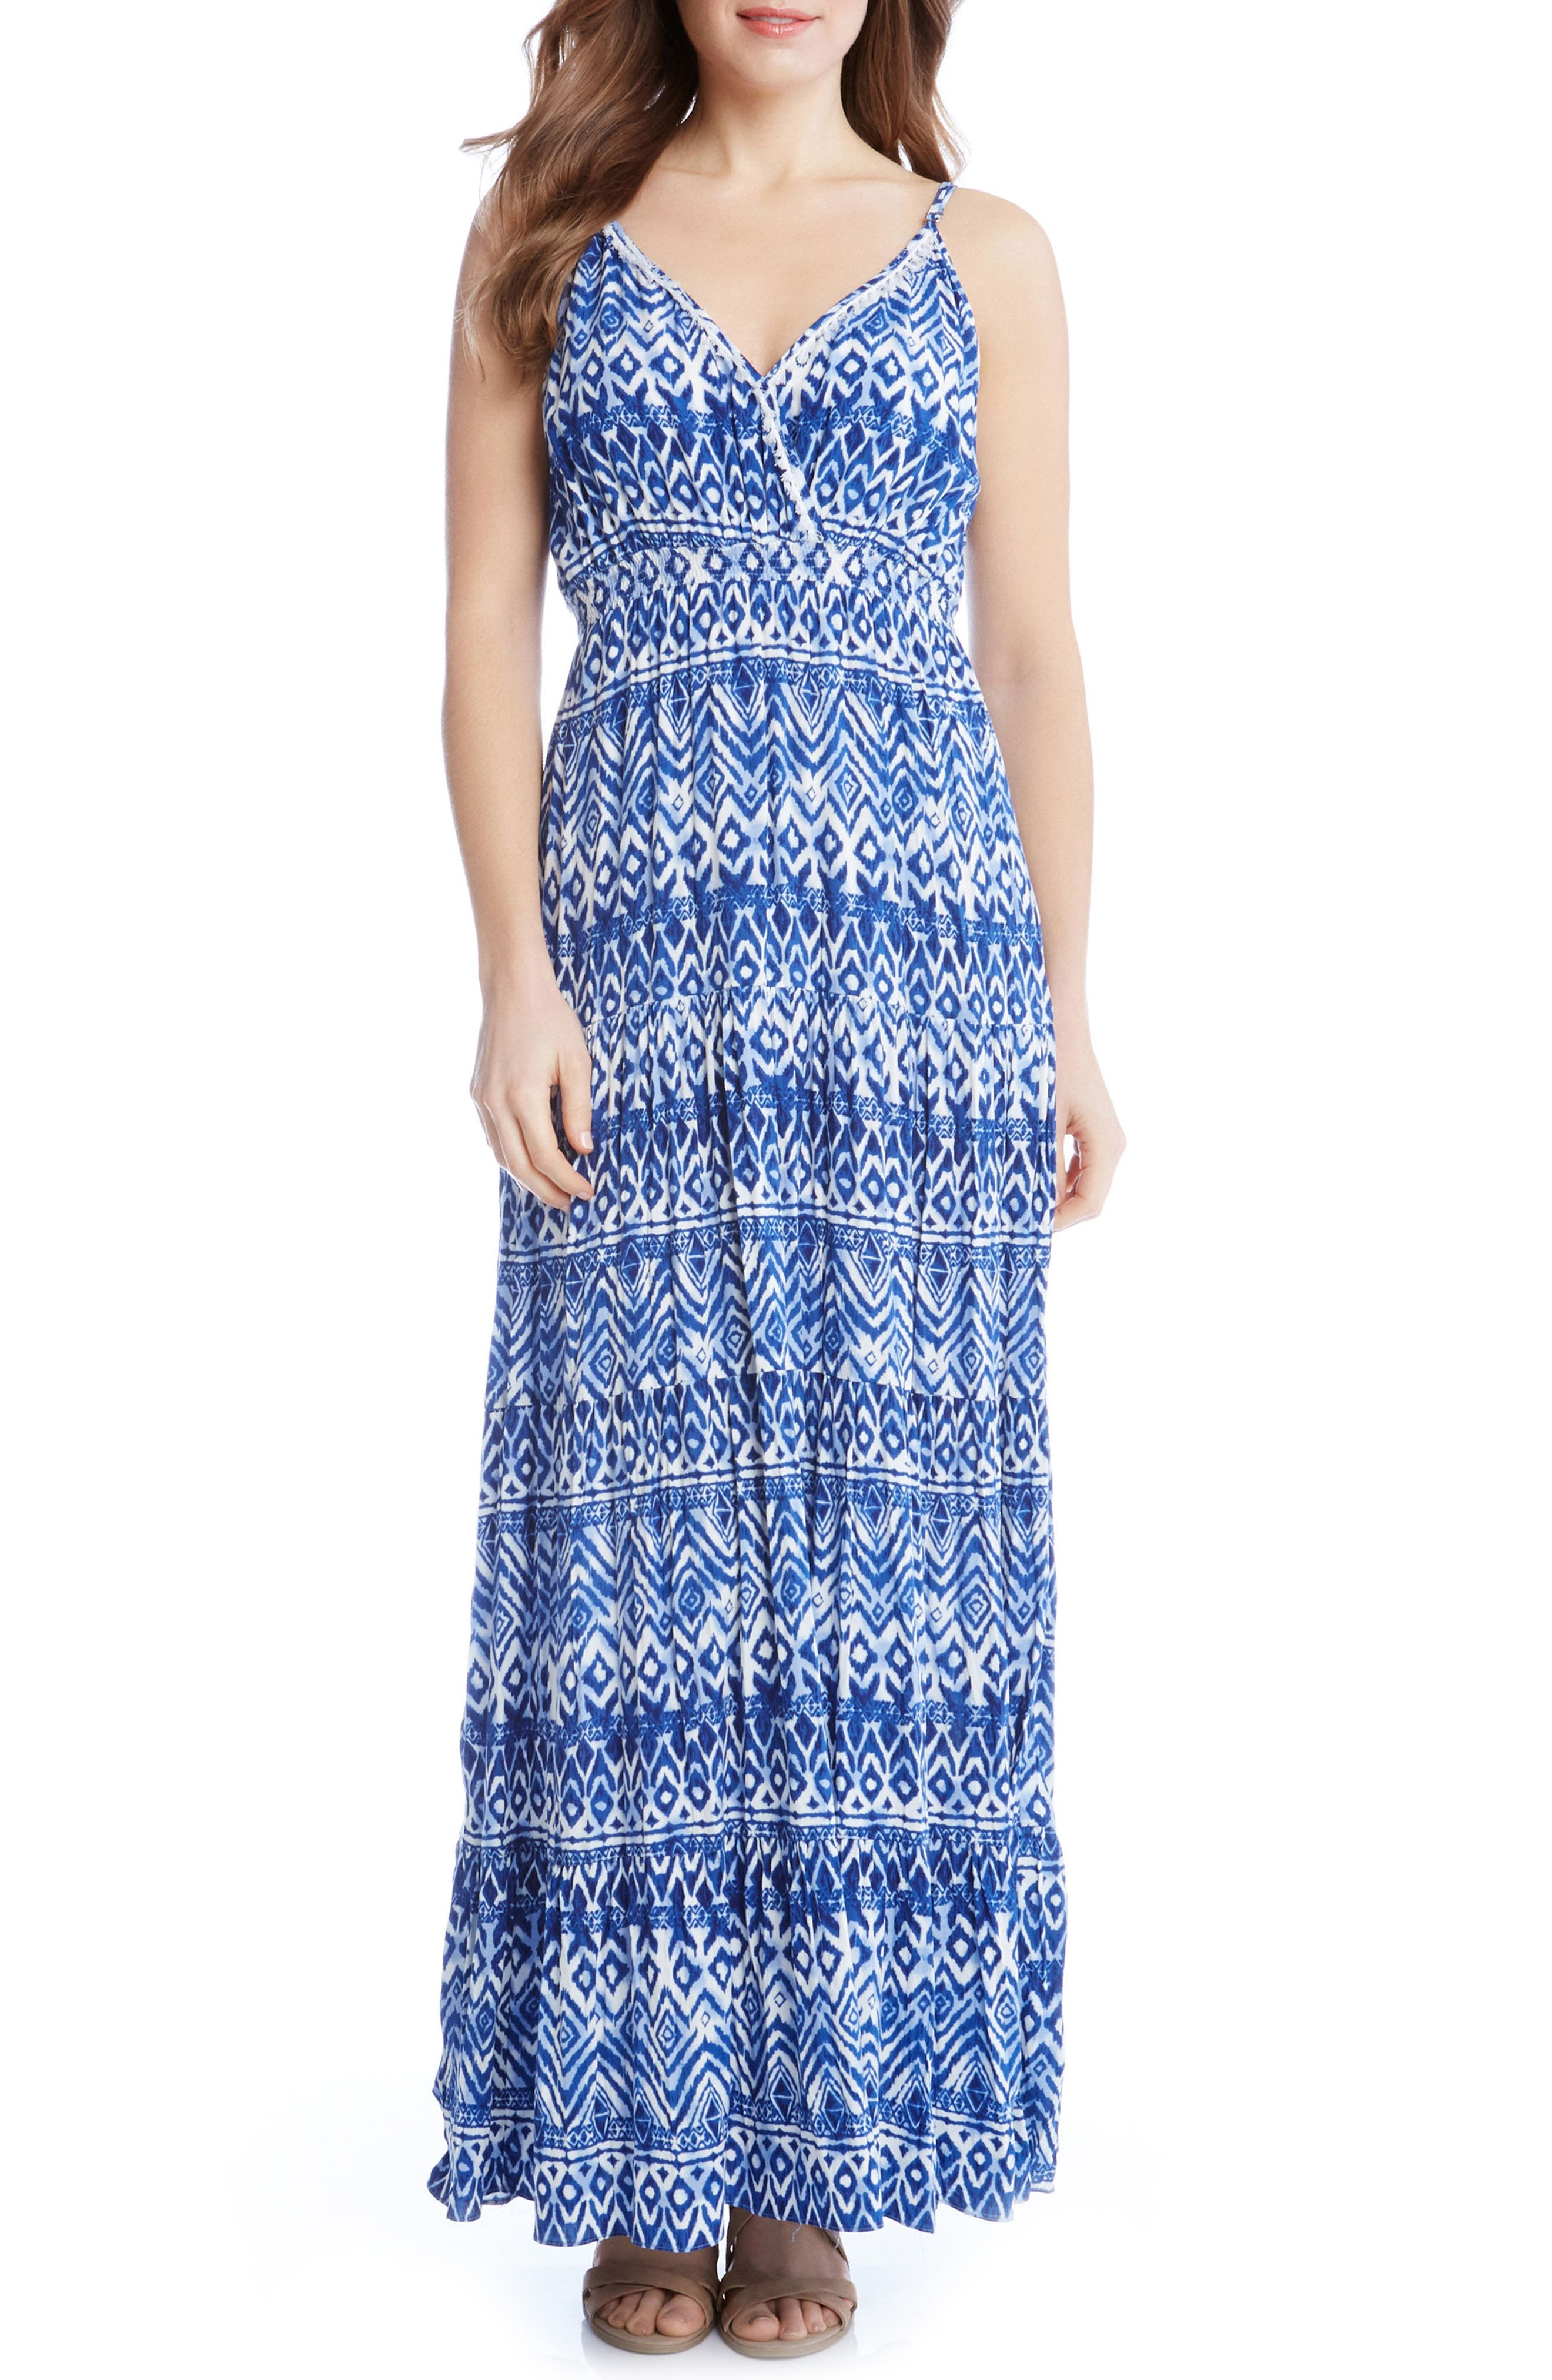 Alternate Image 1 Selected - Karen Kane Batik Print Tiered Maxi Dress